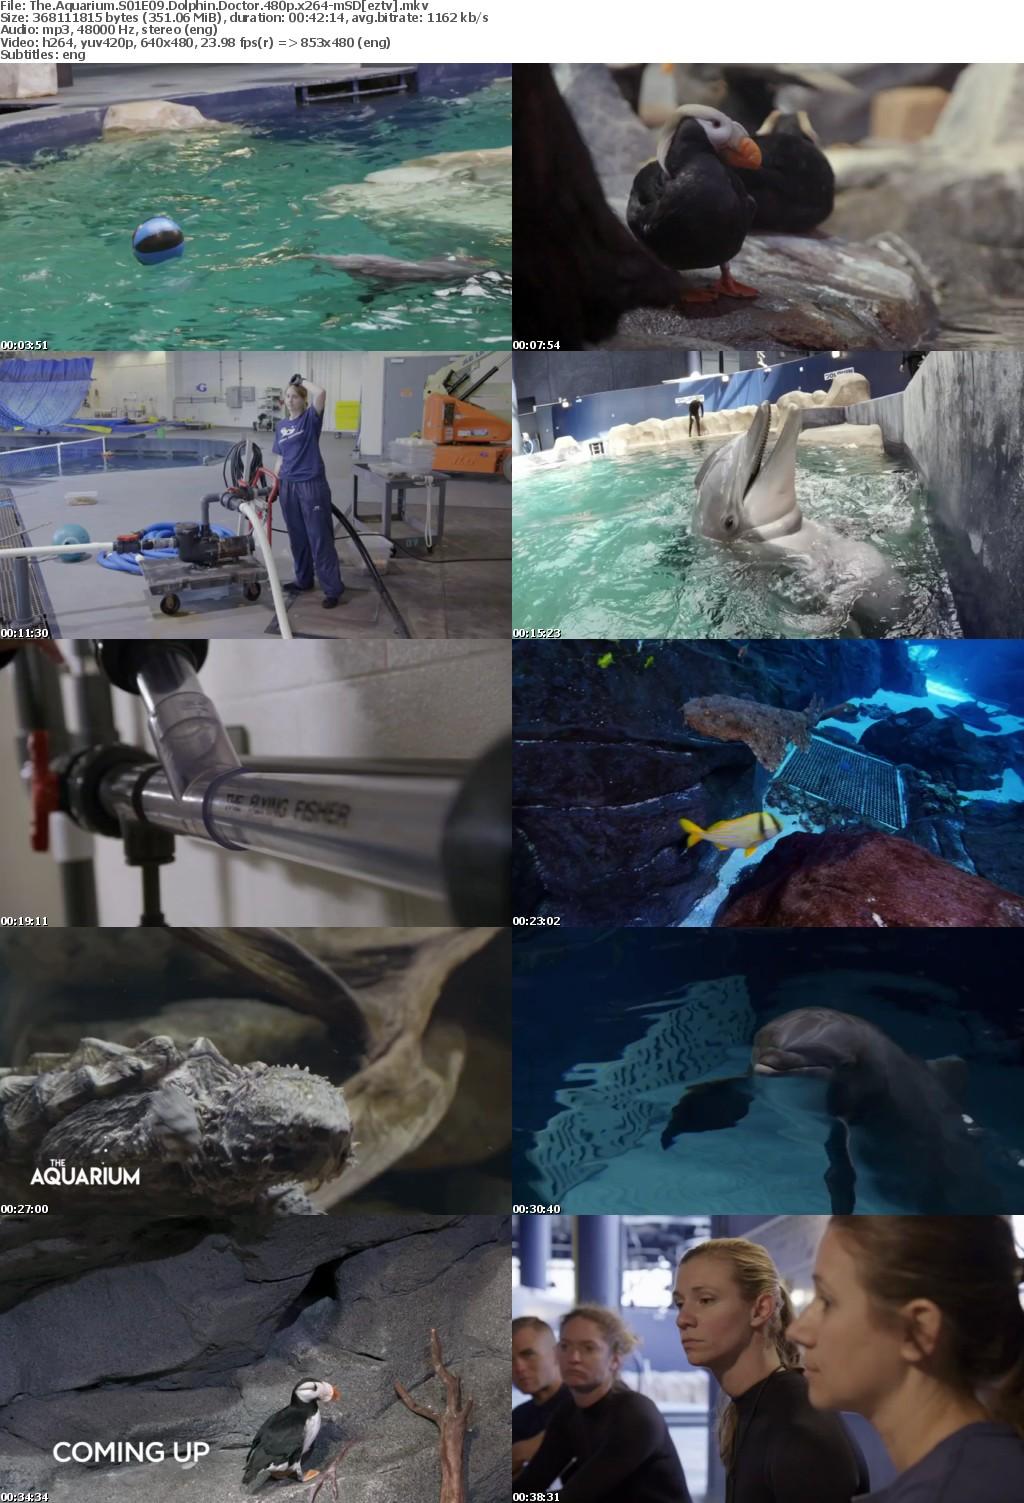 The Aquarium S01E09 Dolphin Doctor 480p x264 mSD